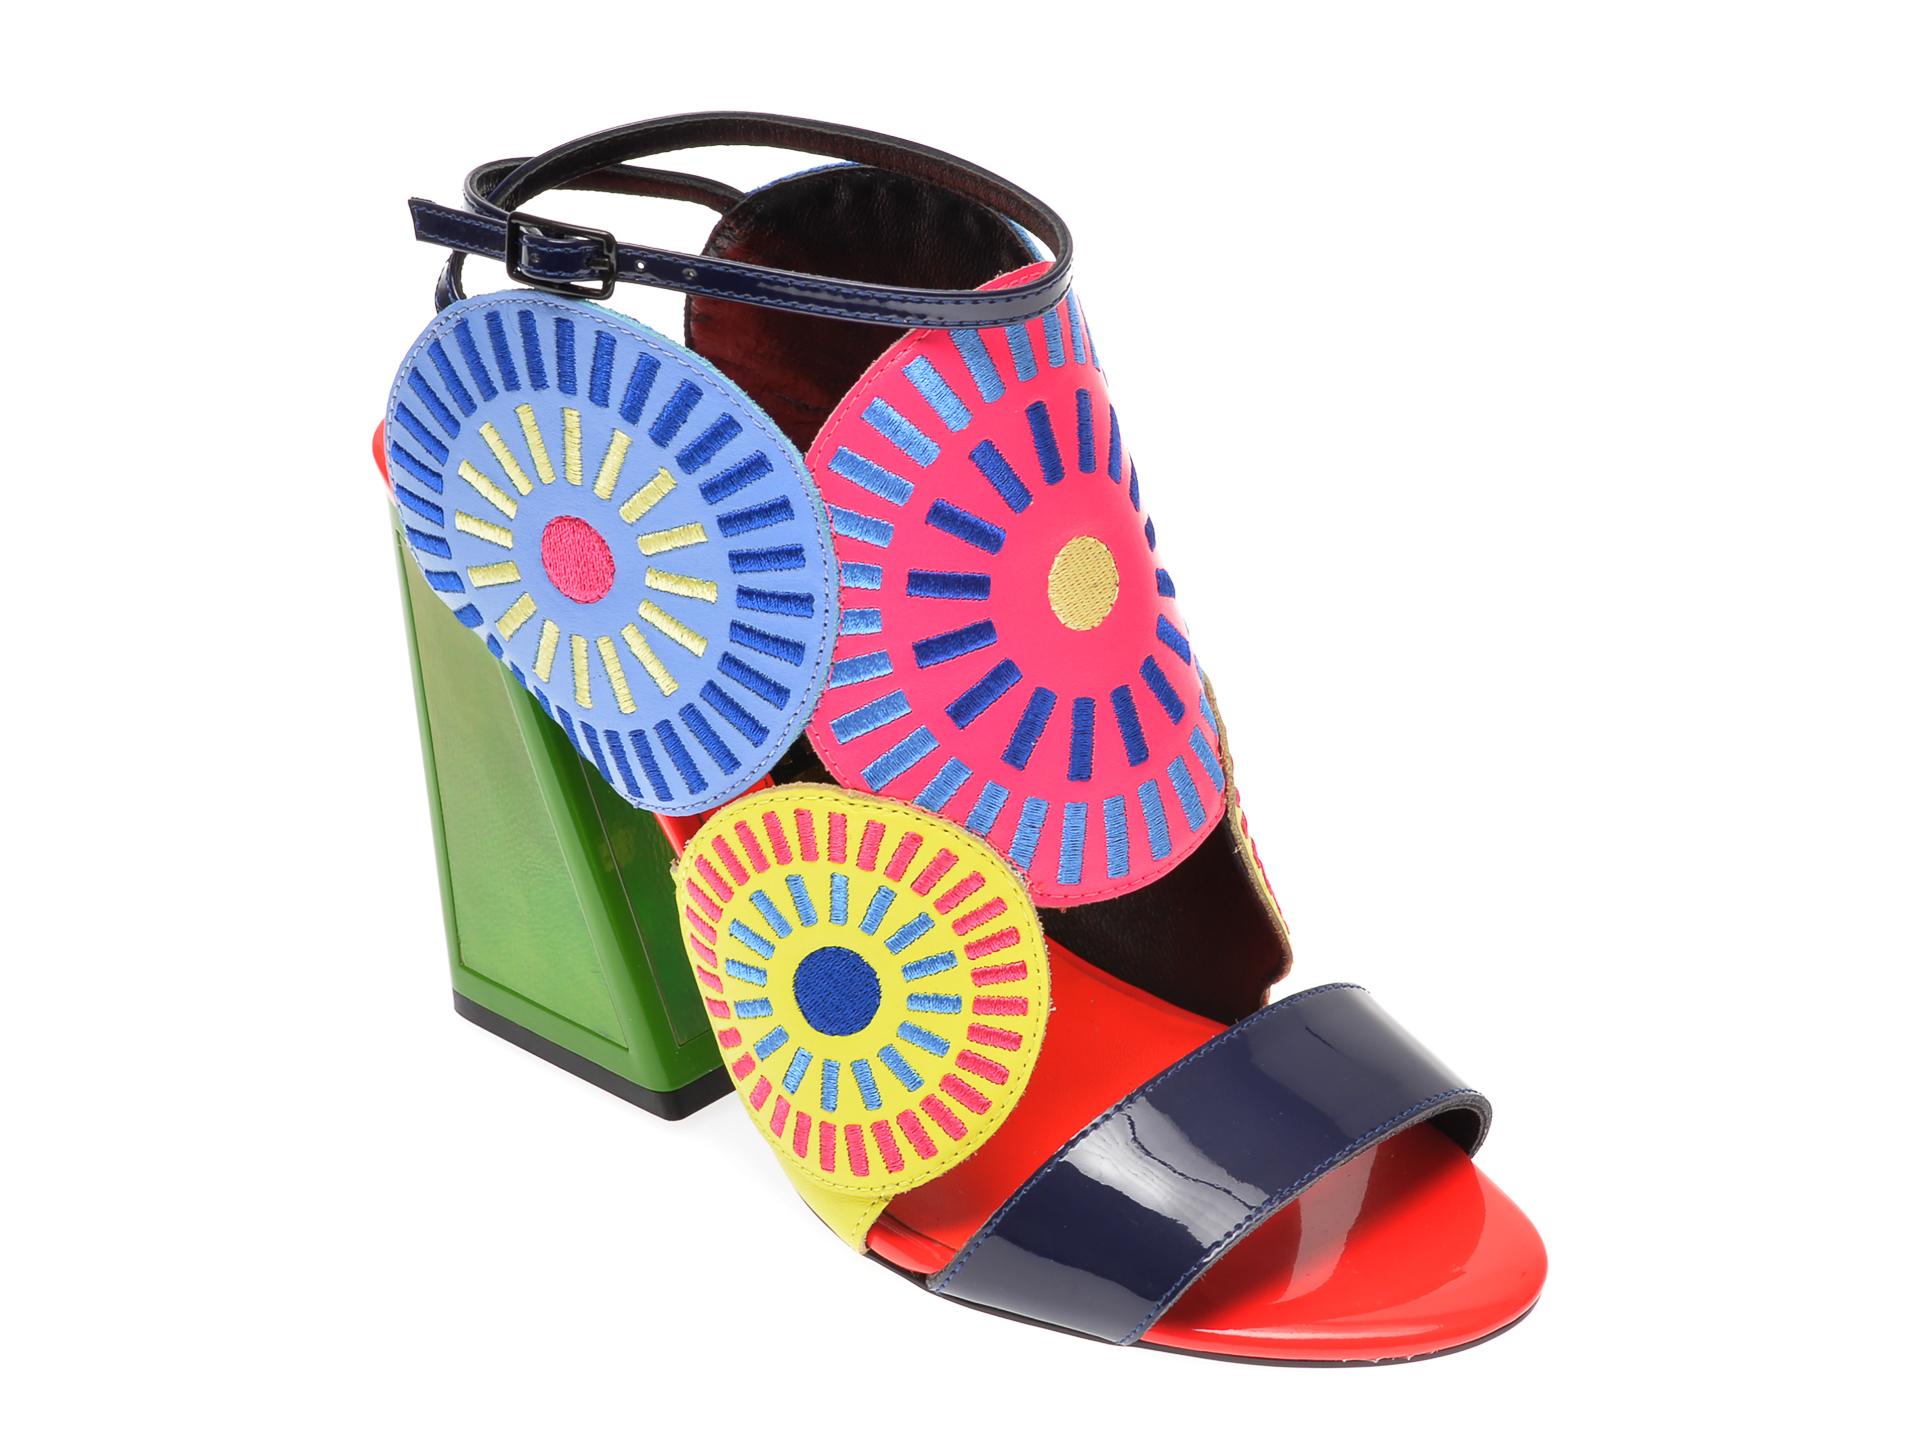 Sandale EPICA multicolor, FRIDA, din piele naturala